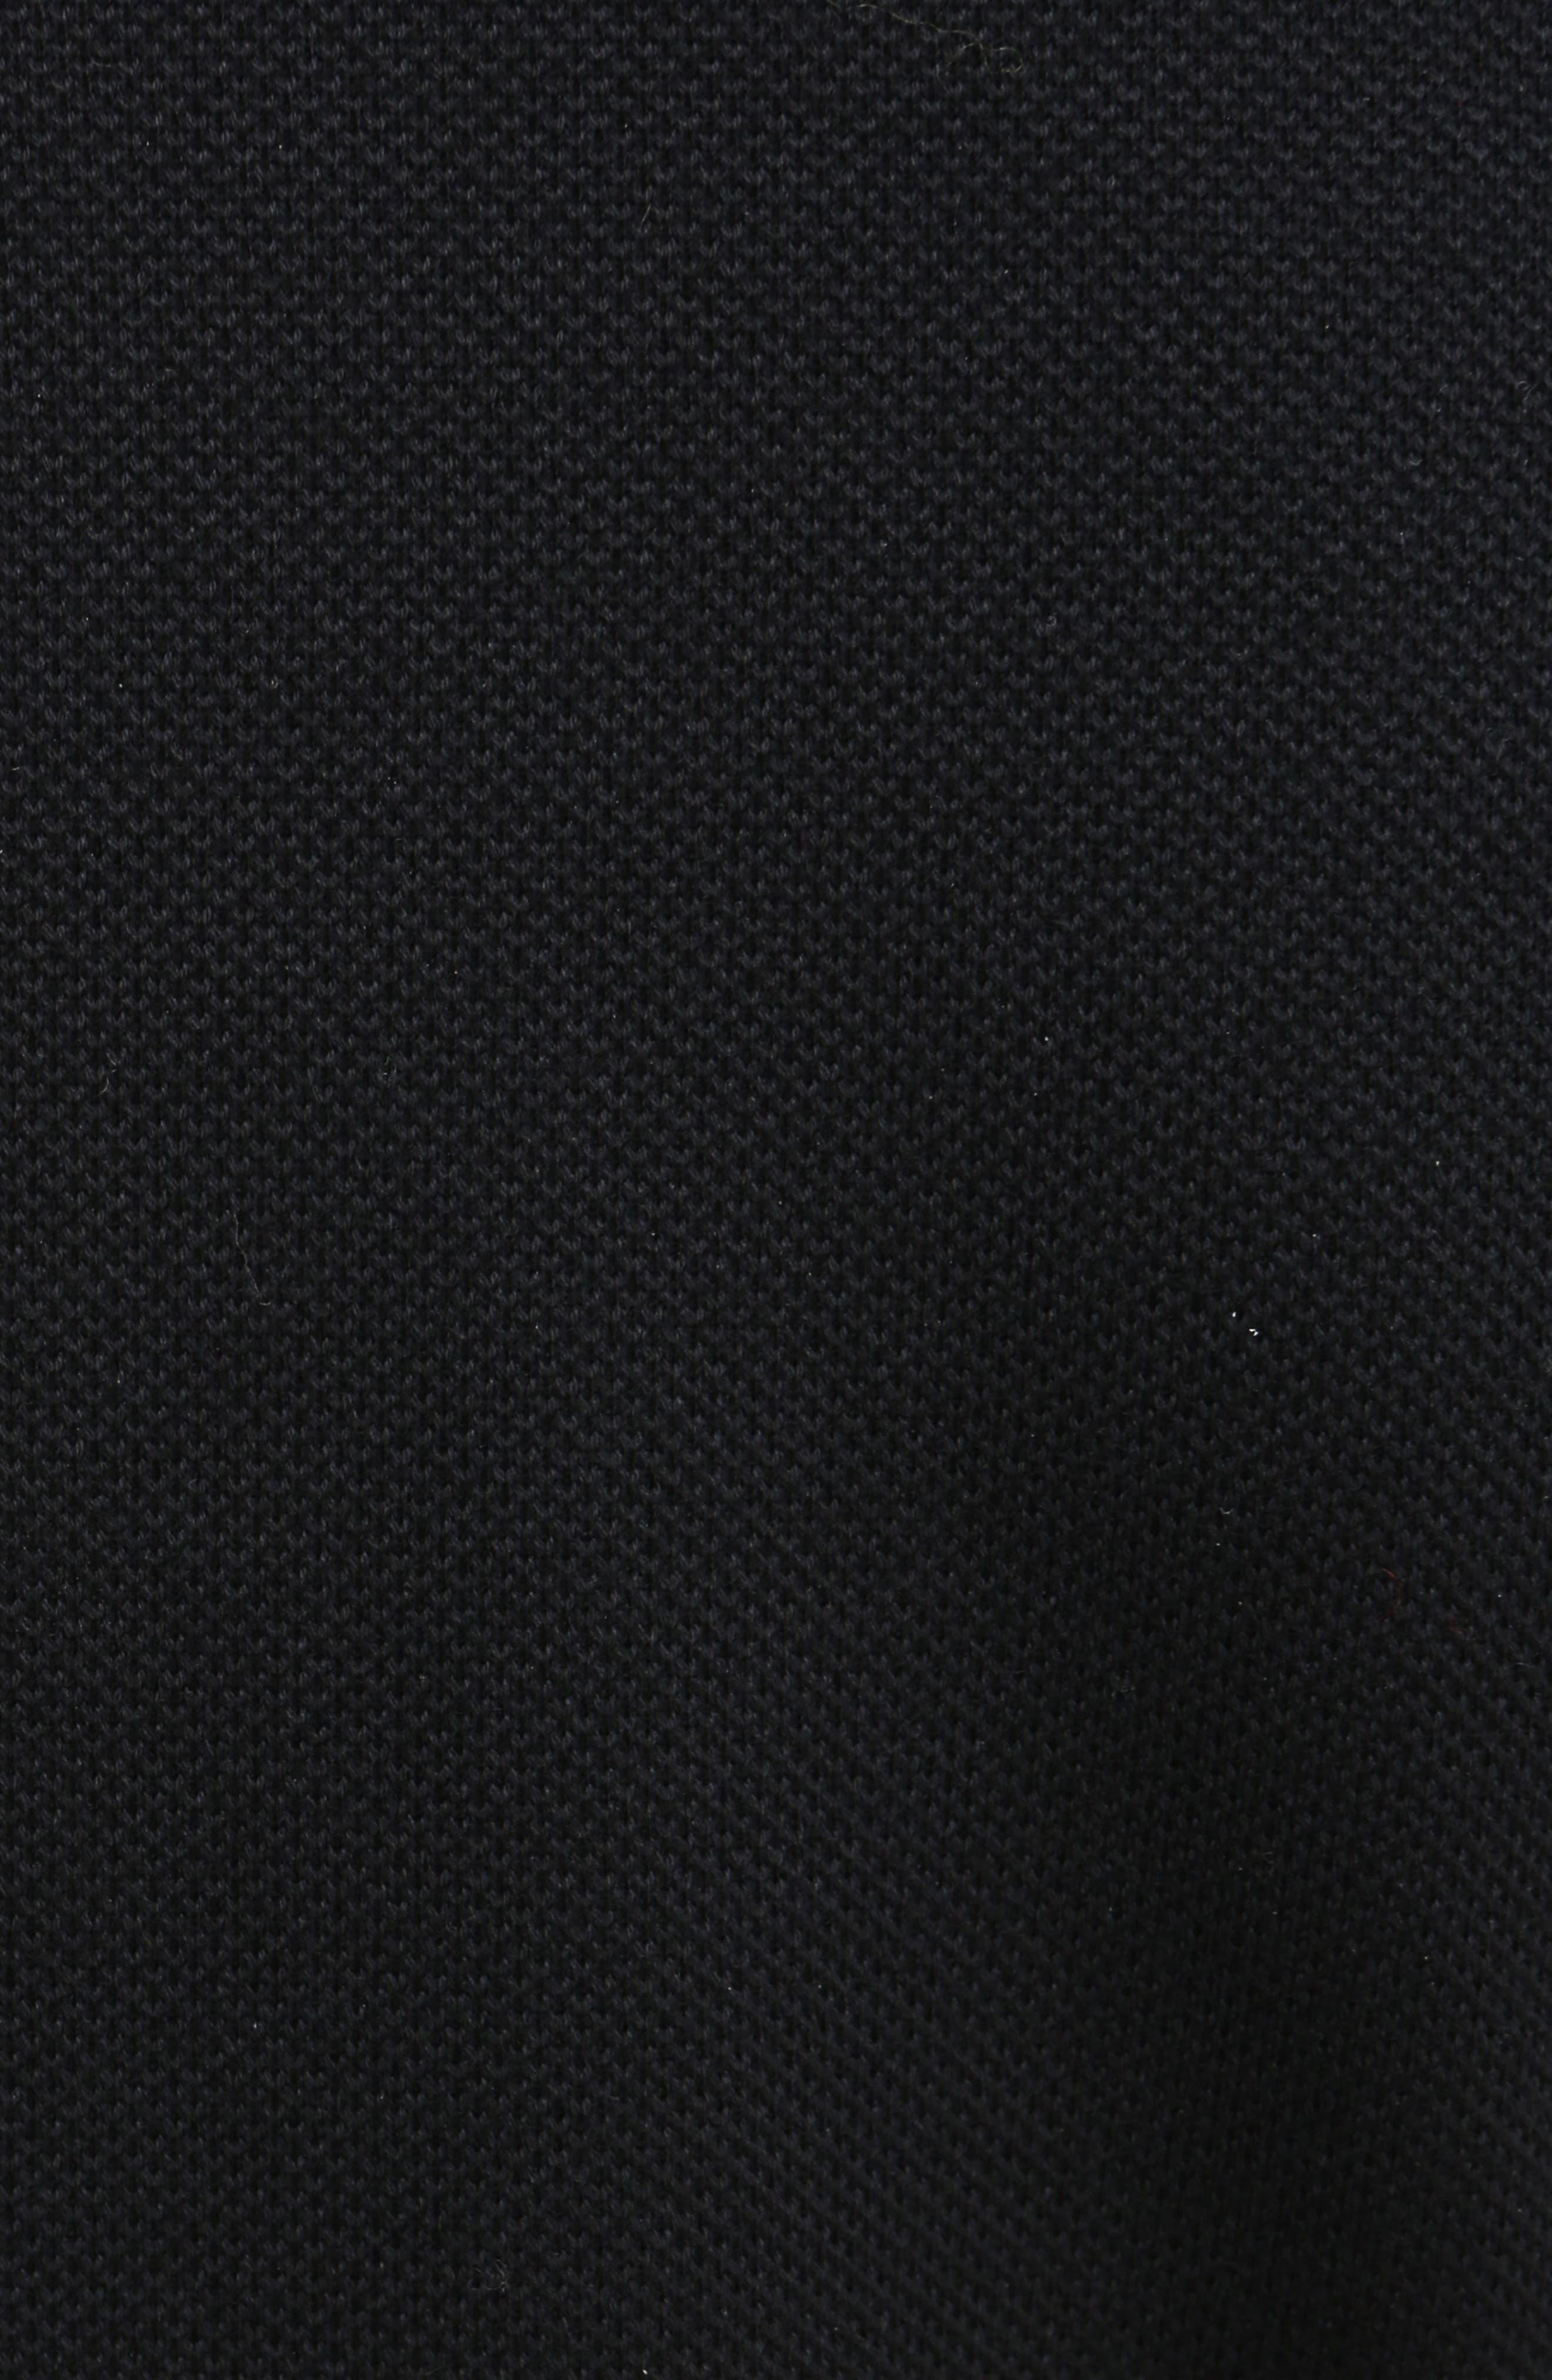 Star Embellished Polo Dress,                             Alternate thumbnail 5, color,                             001